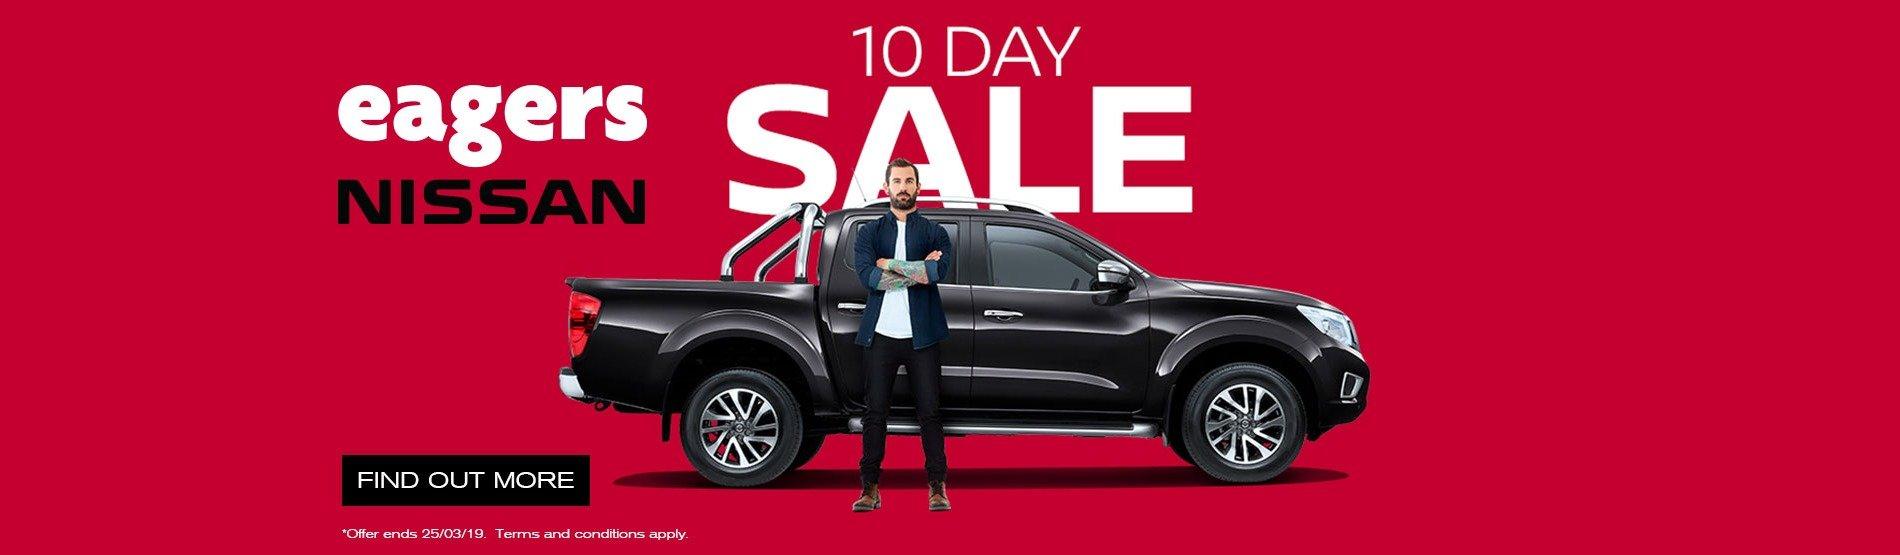 nissan 10 day sale